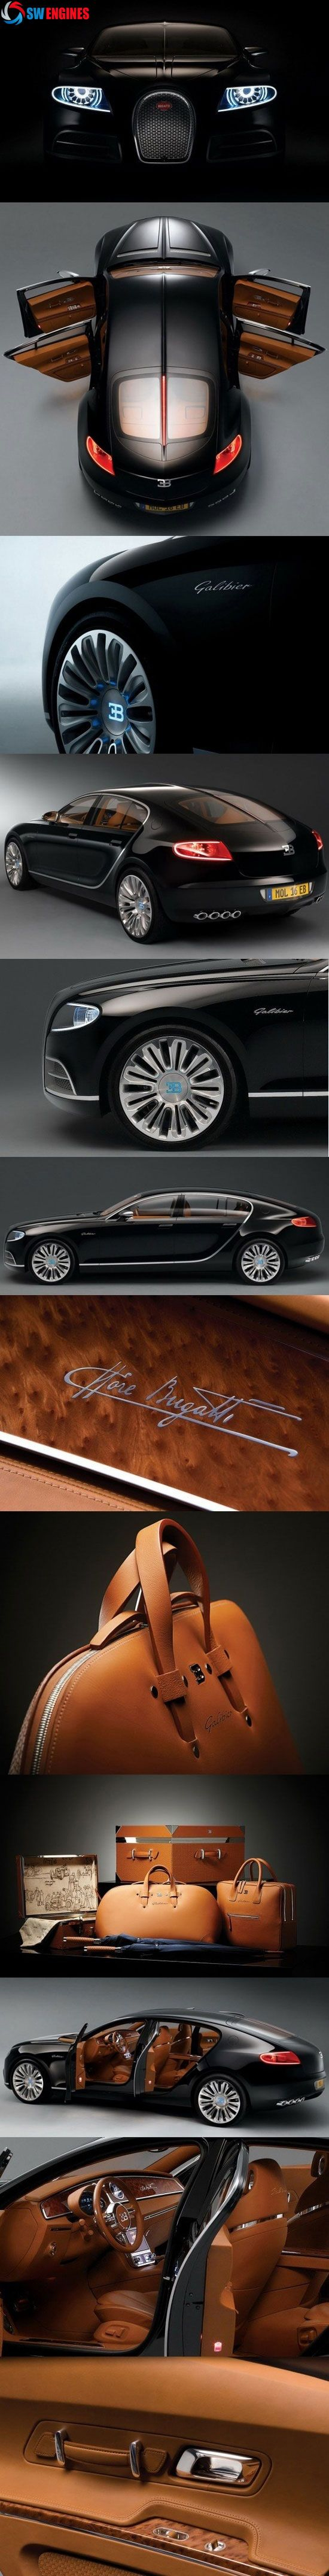 26cc8db25db1f1b92a55f8323ecc98f4--cool-cars-automobile Inspiring Bugatti Veyron Price Australian Dollars Cars Trend